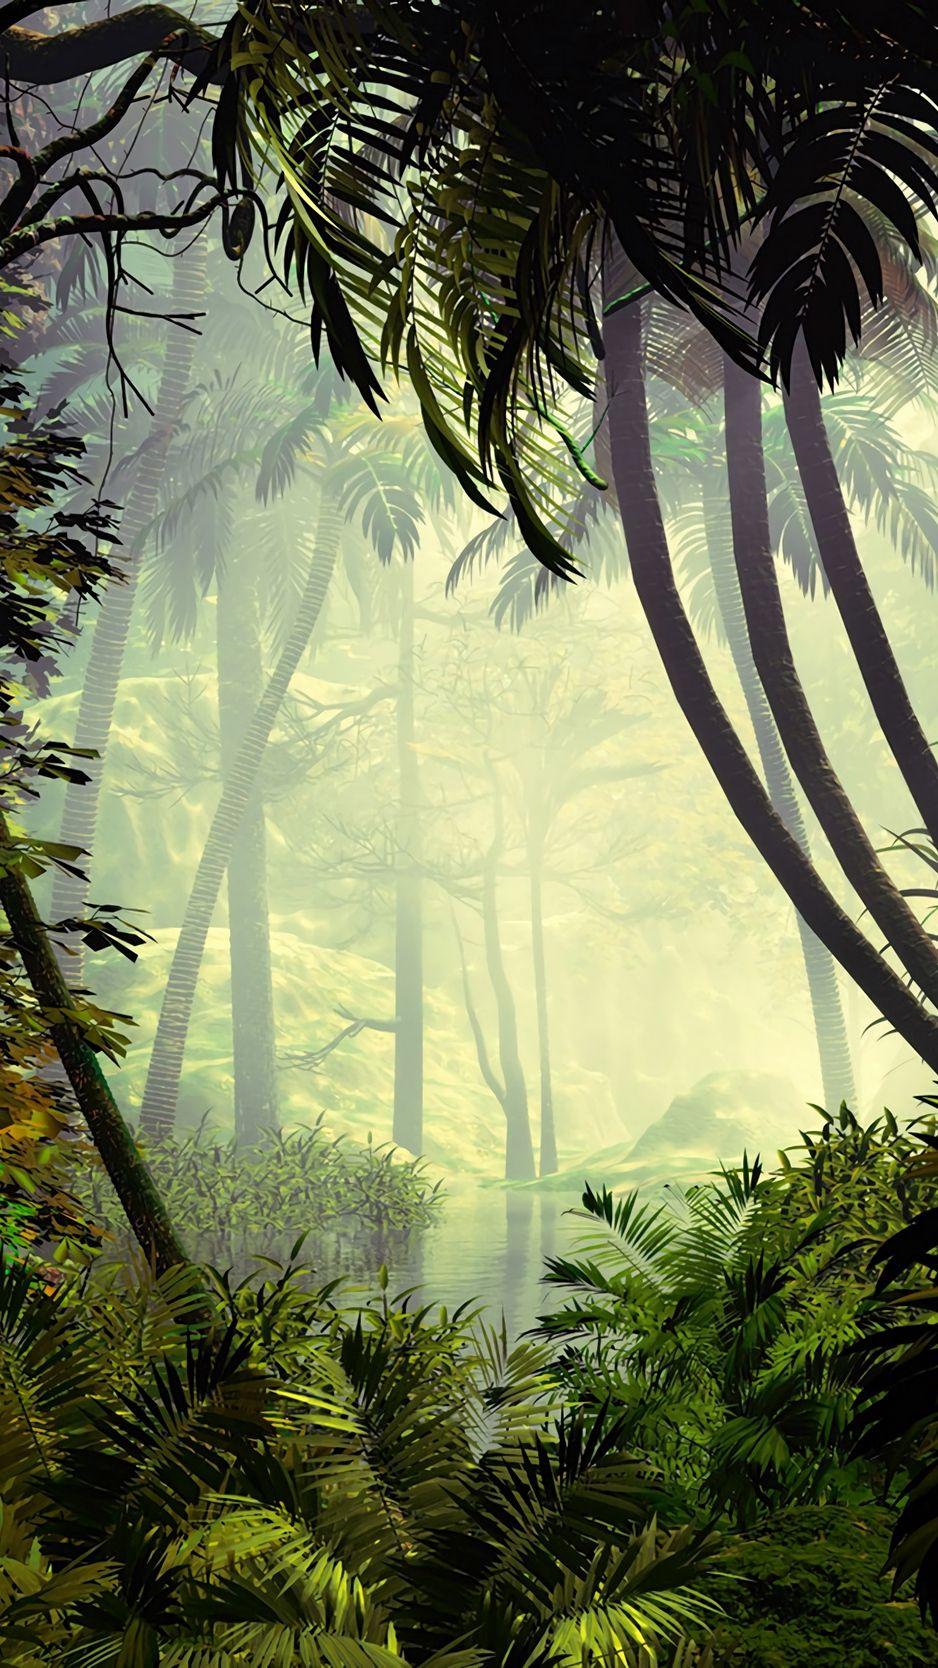 Palm Trees Trees Jungle Fog Wallpaper Jungle Wallpaper Forest Wallpaper Nature Wallpaper